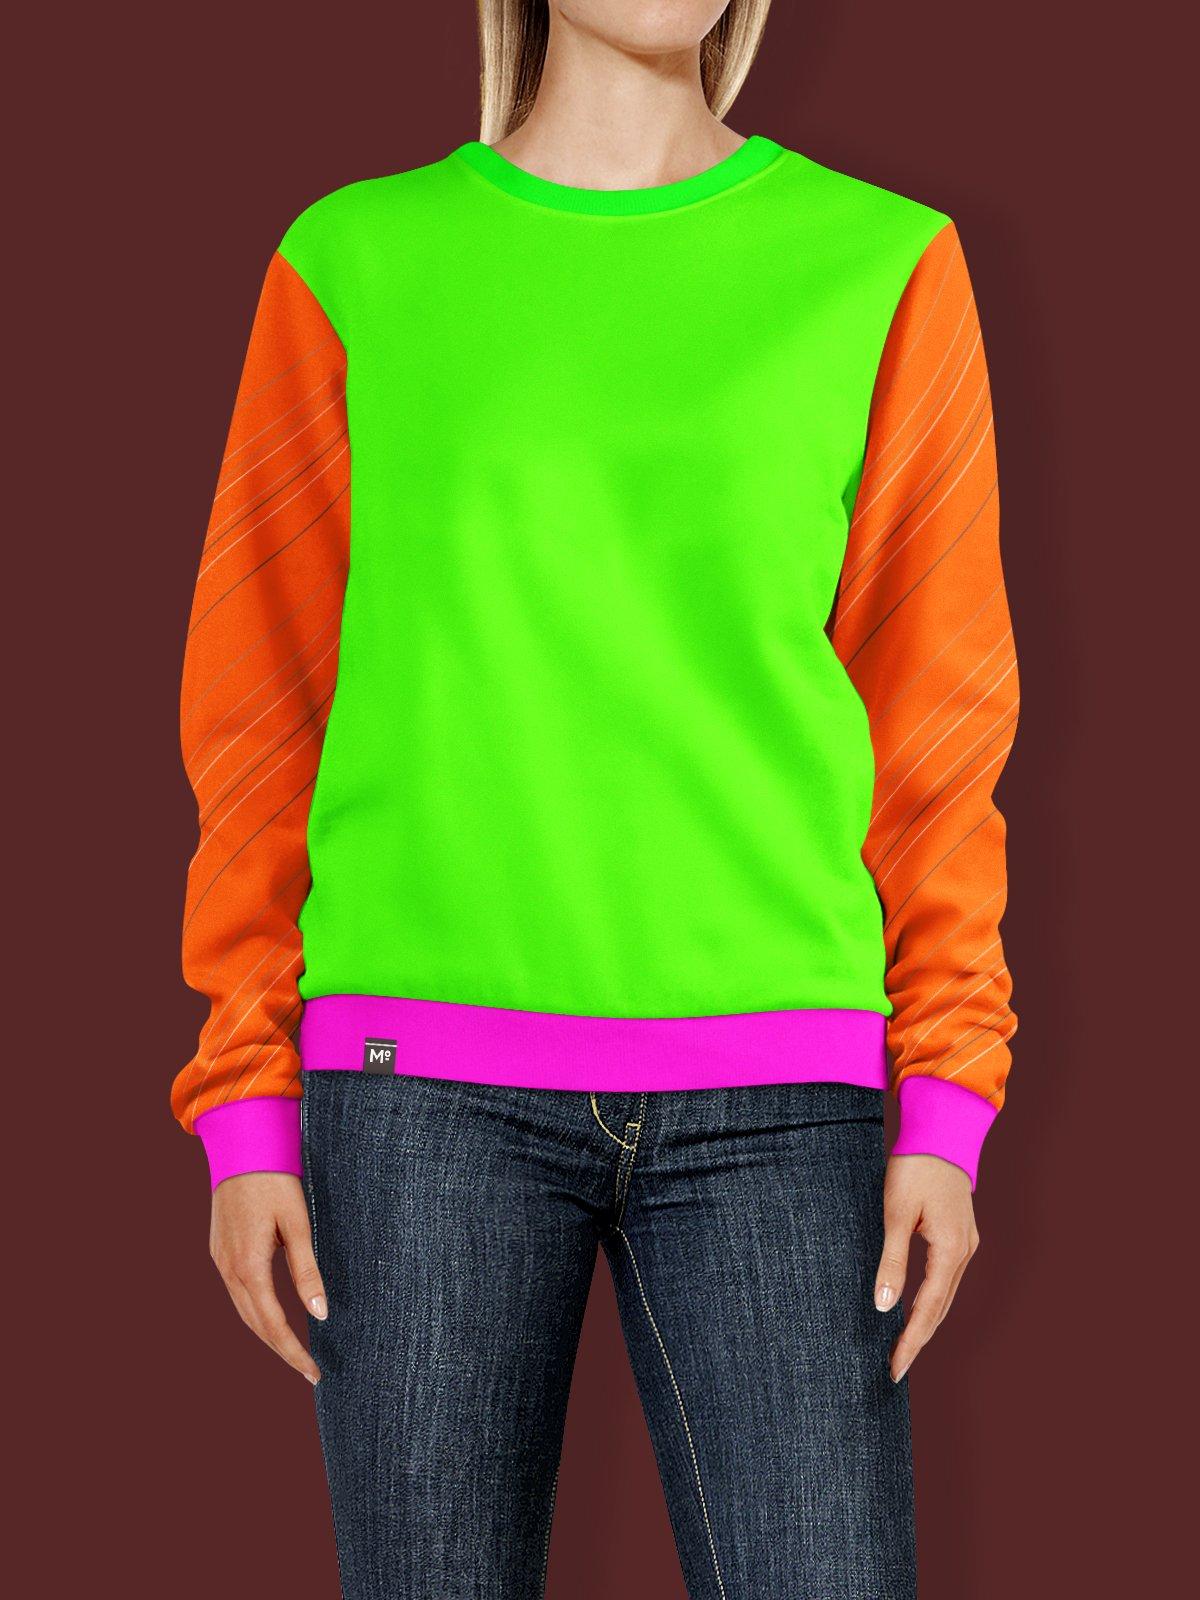 Colorful Sweat Shirt Mockup